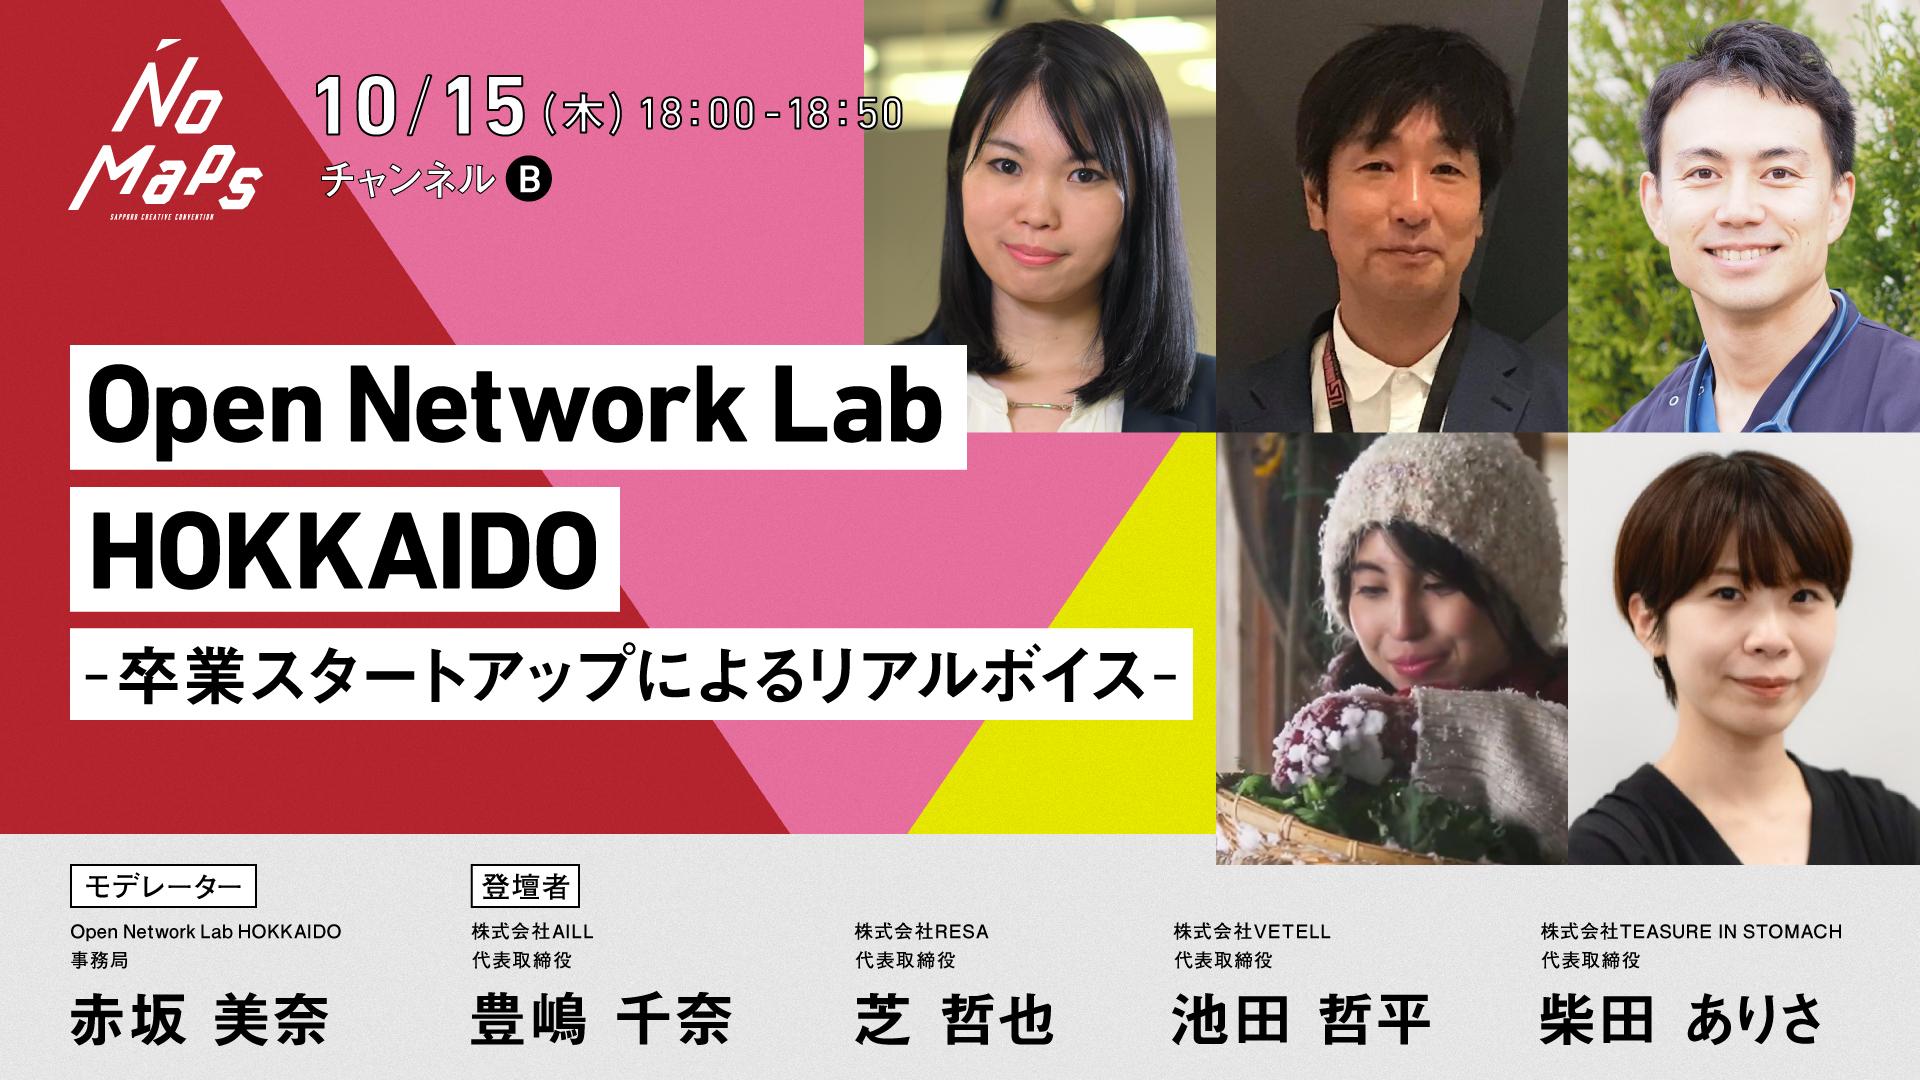 【NoMapsレポート】Open Network Lab HOKKAIDO -卒業スタートアップによるリアルボイス-